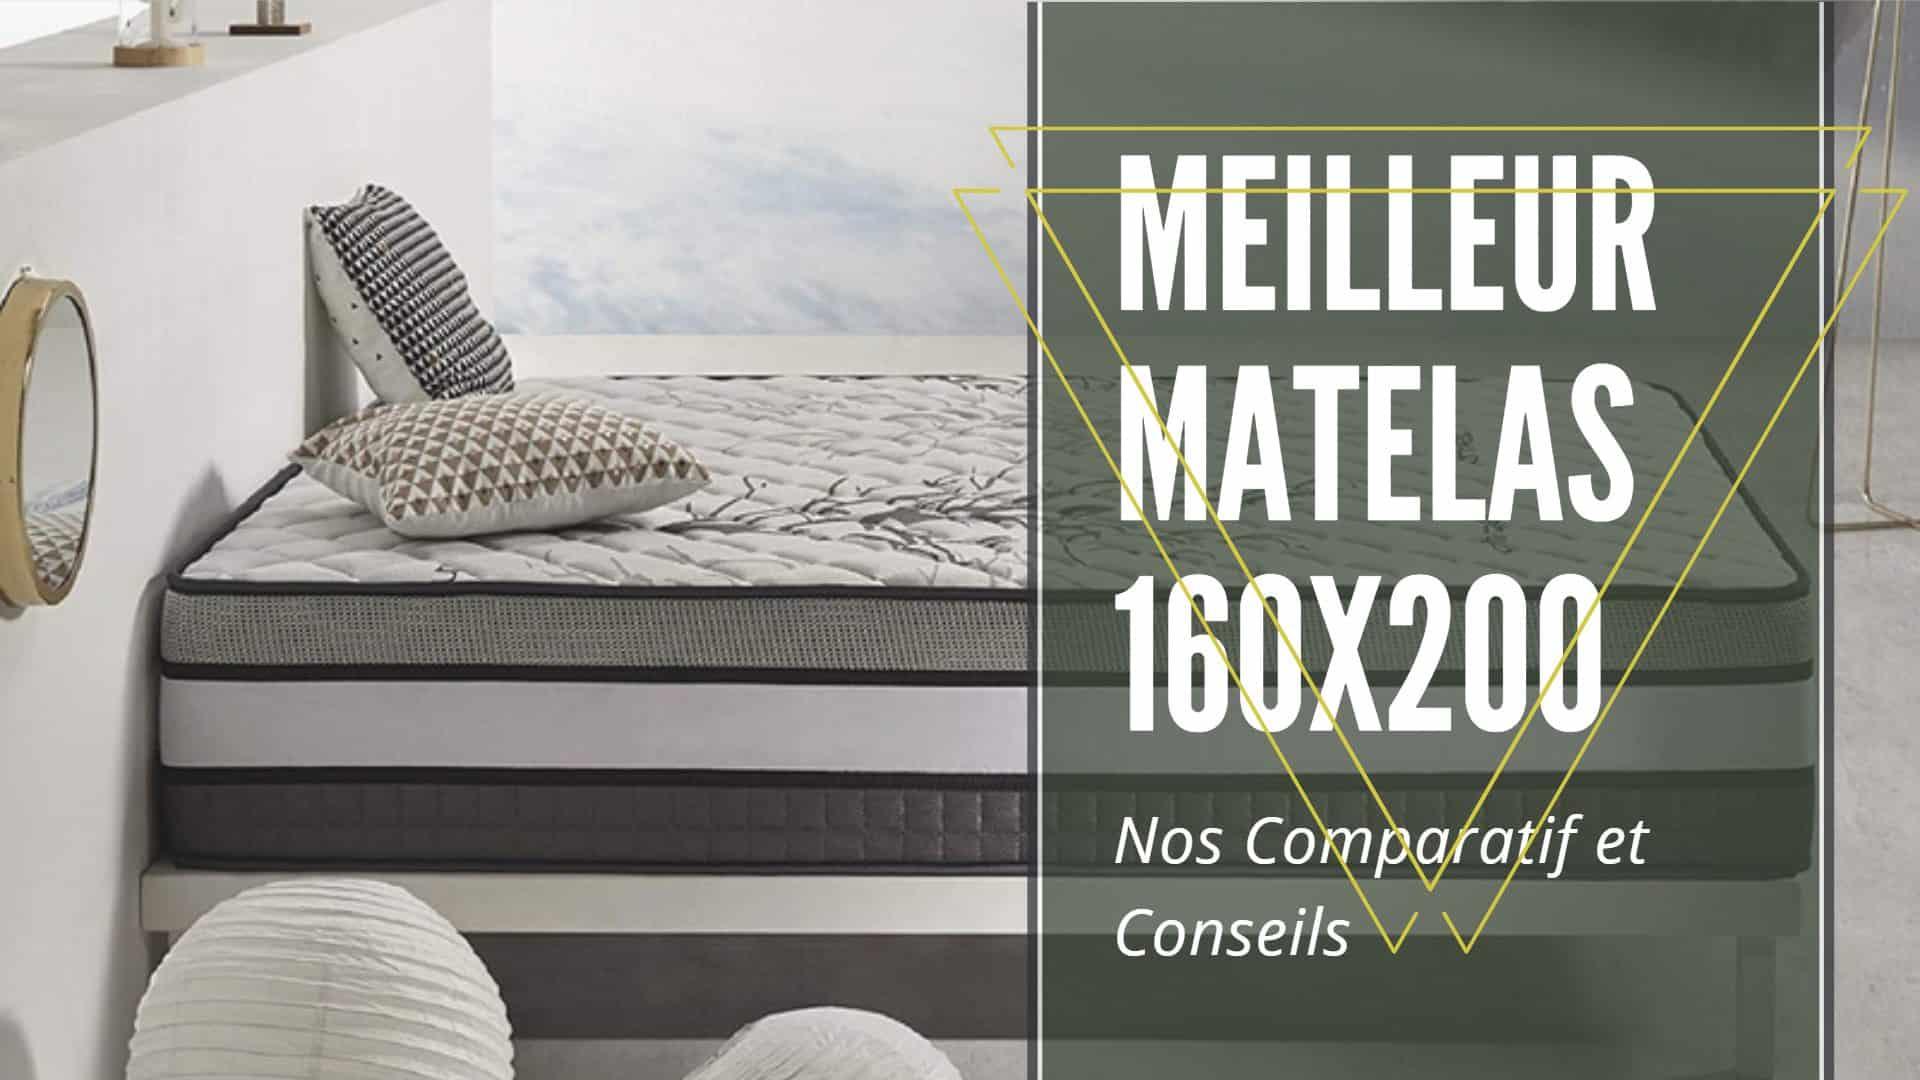 meilleur matelas 160x200